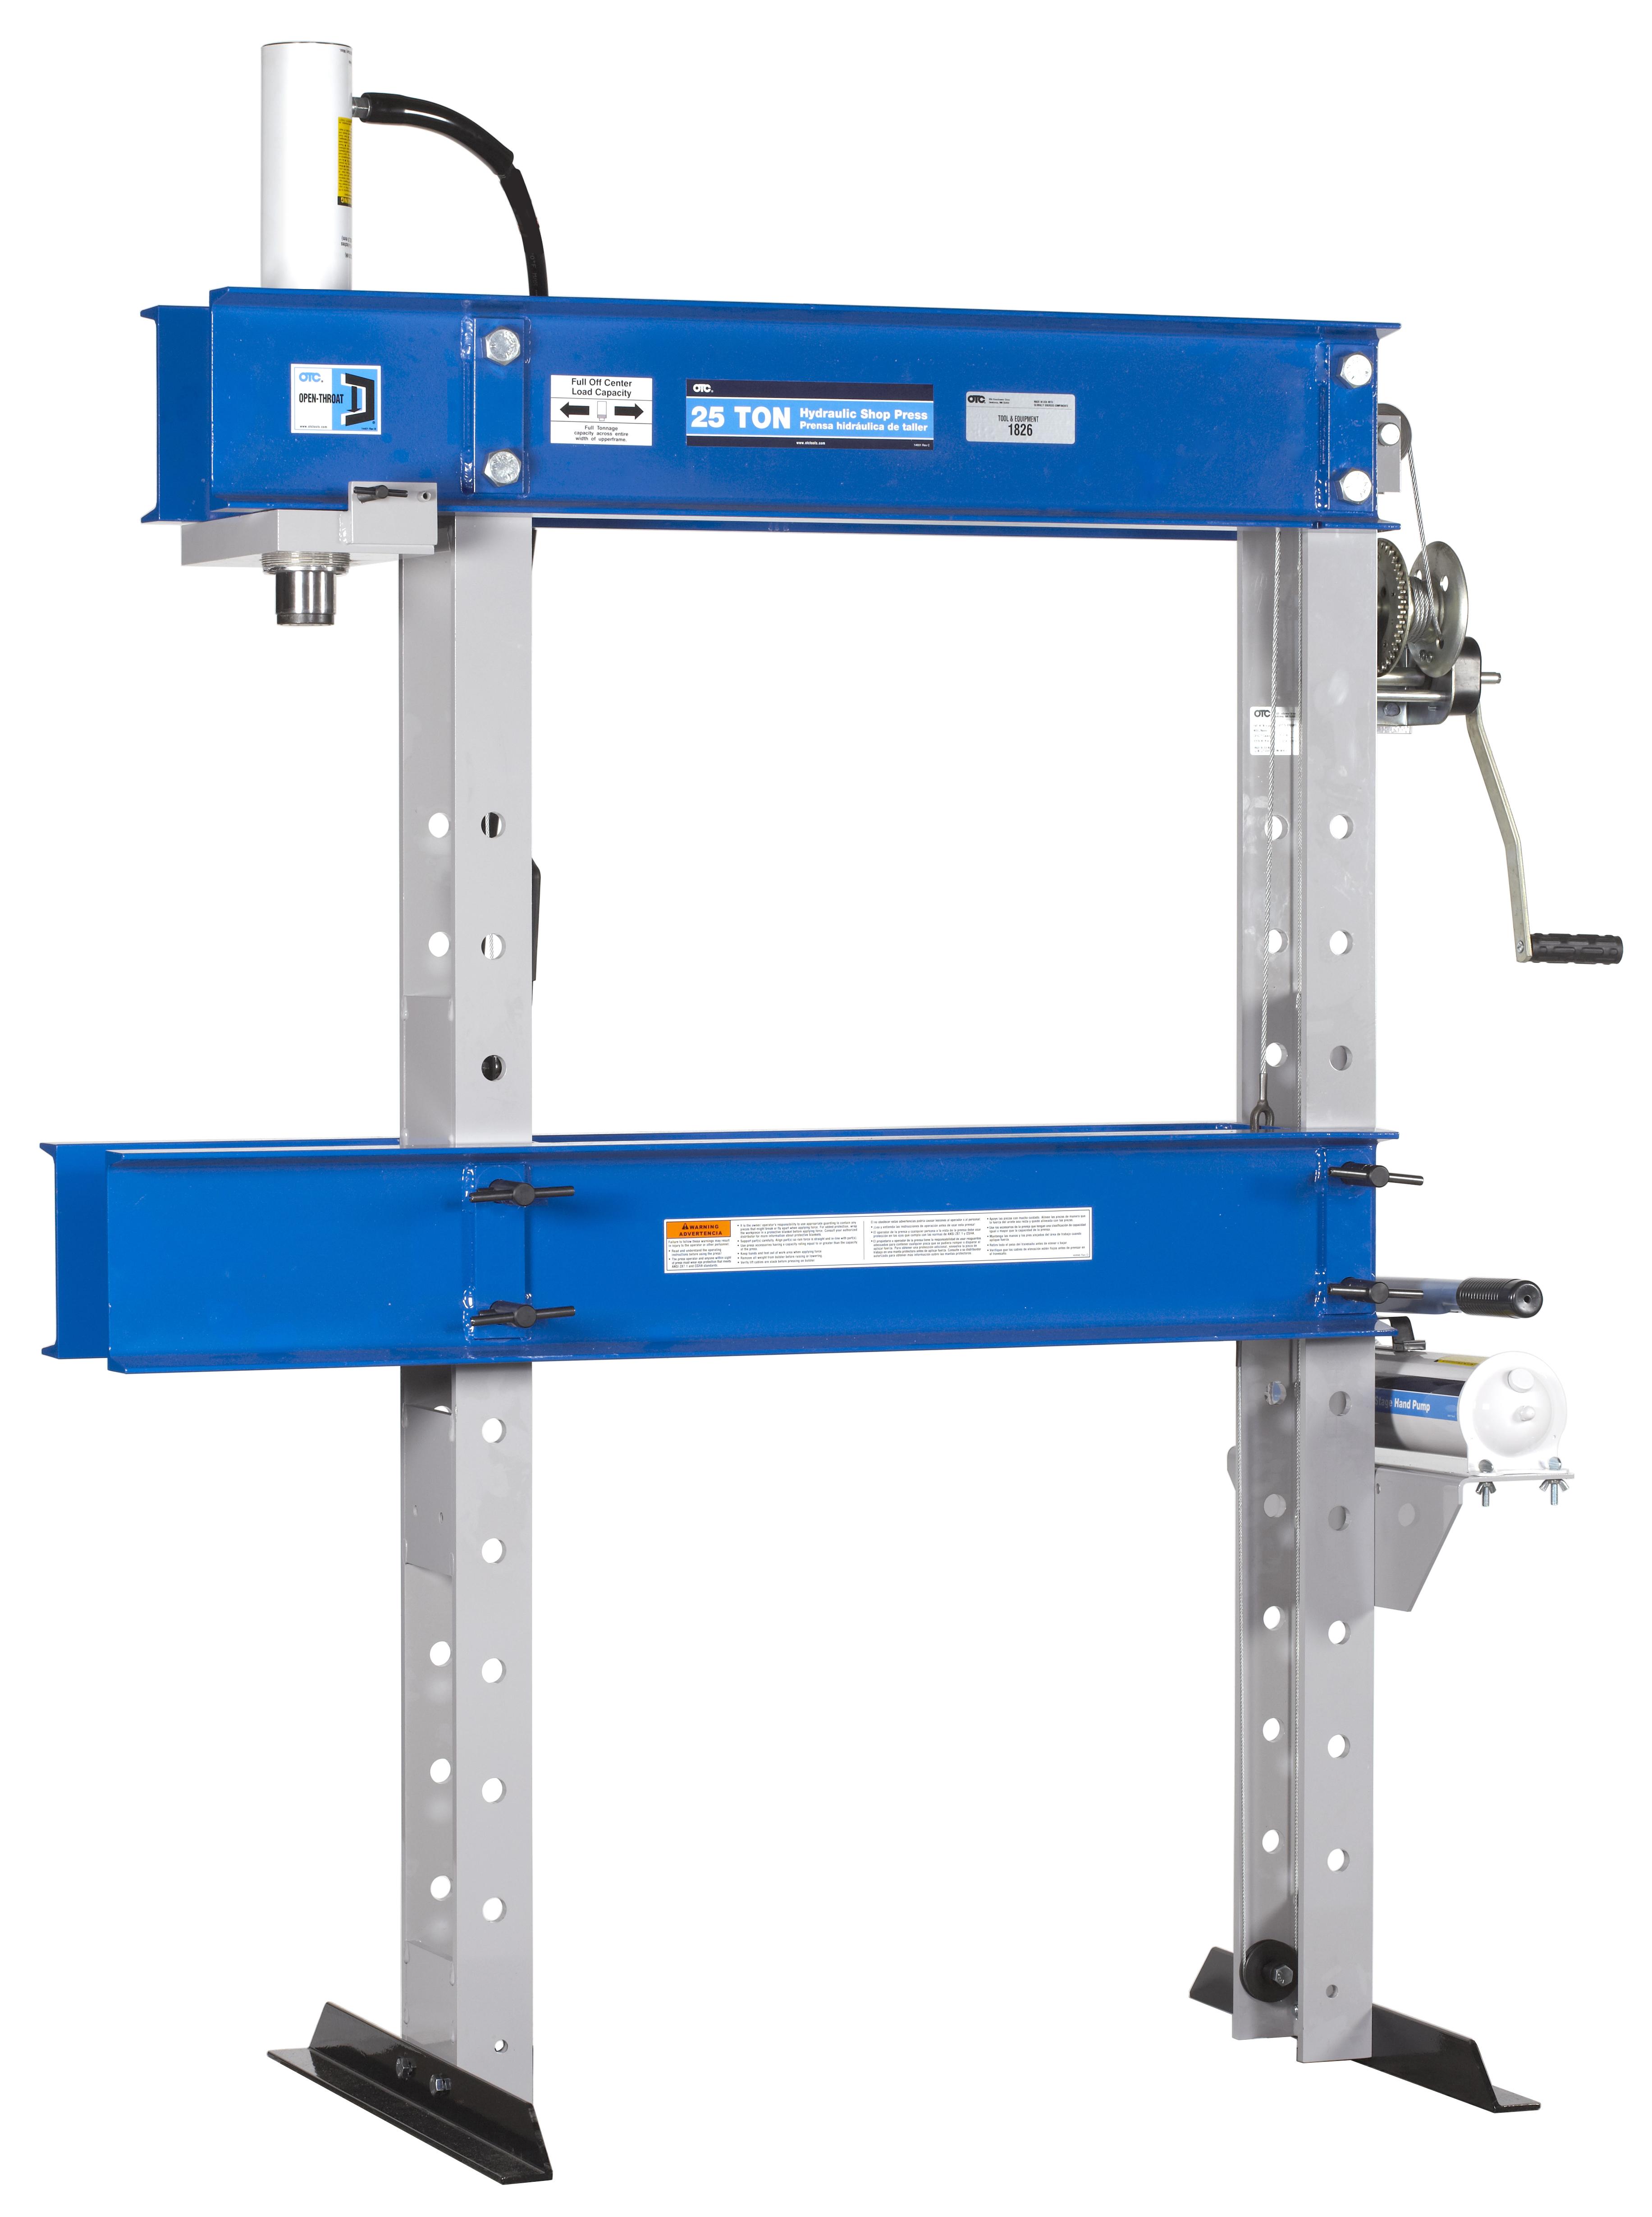 hydraulic press operating instructions